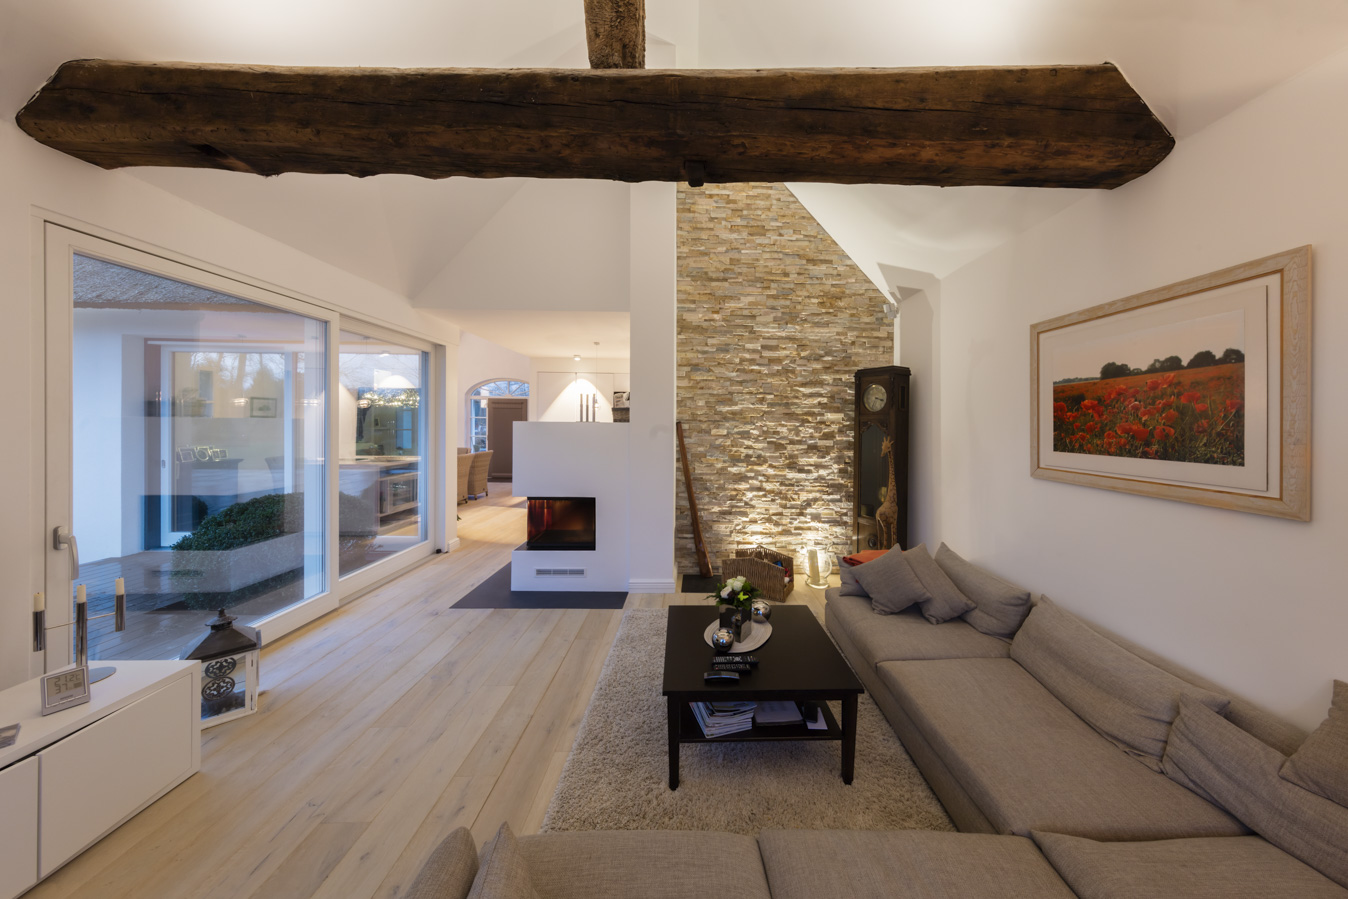 tipps zur richtigen beleuchtung lucente lichtplanung. Black Bedroom Furniture Sets. Home Design Ideas